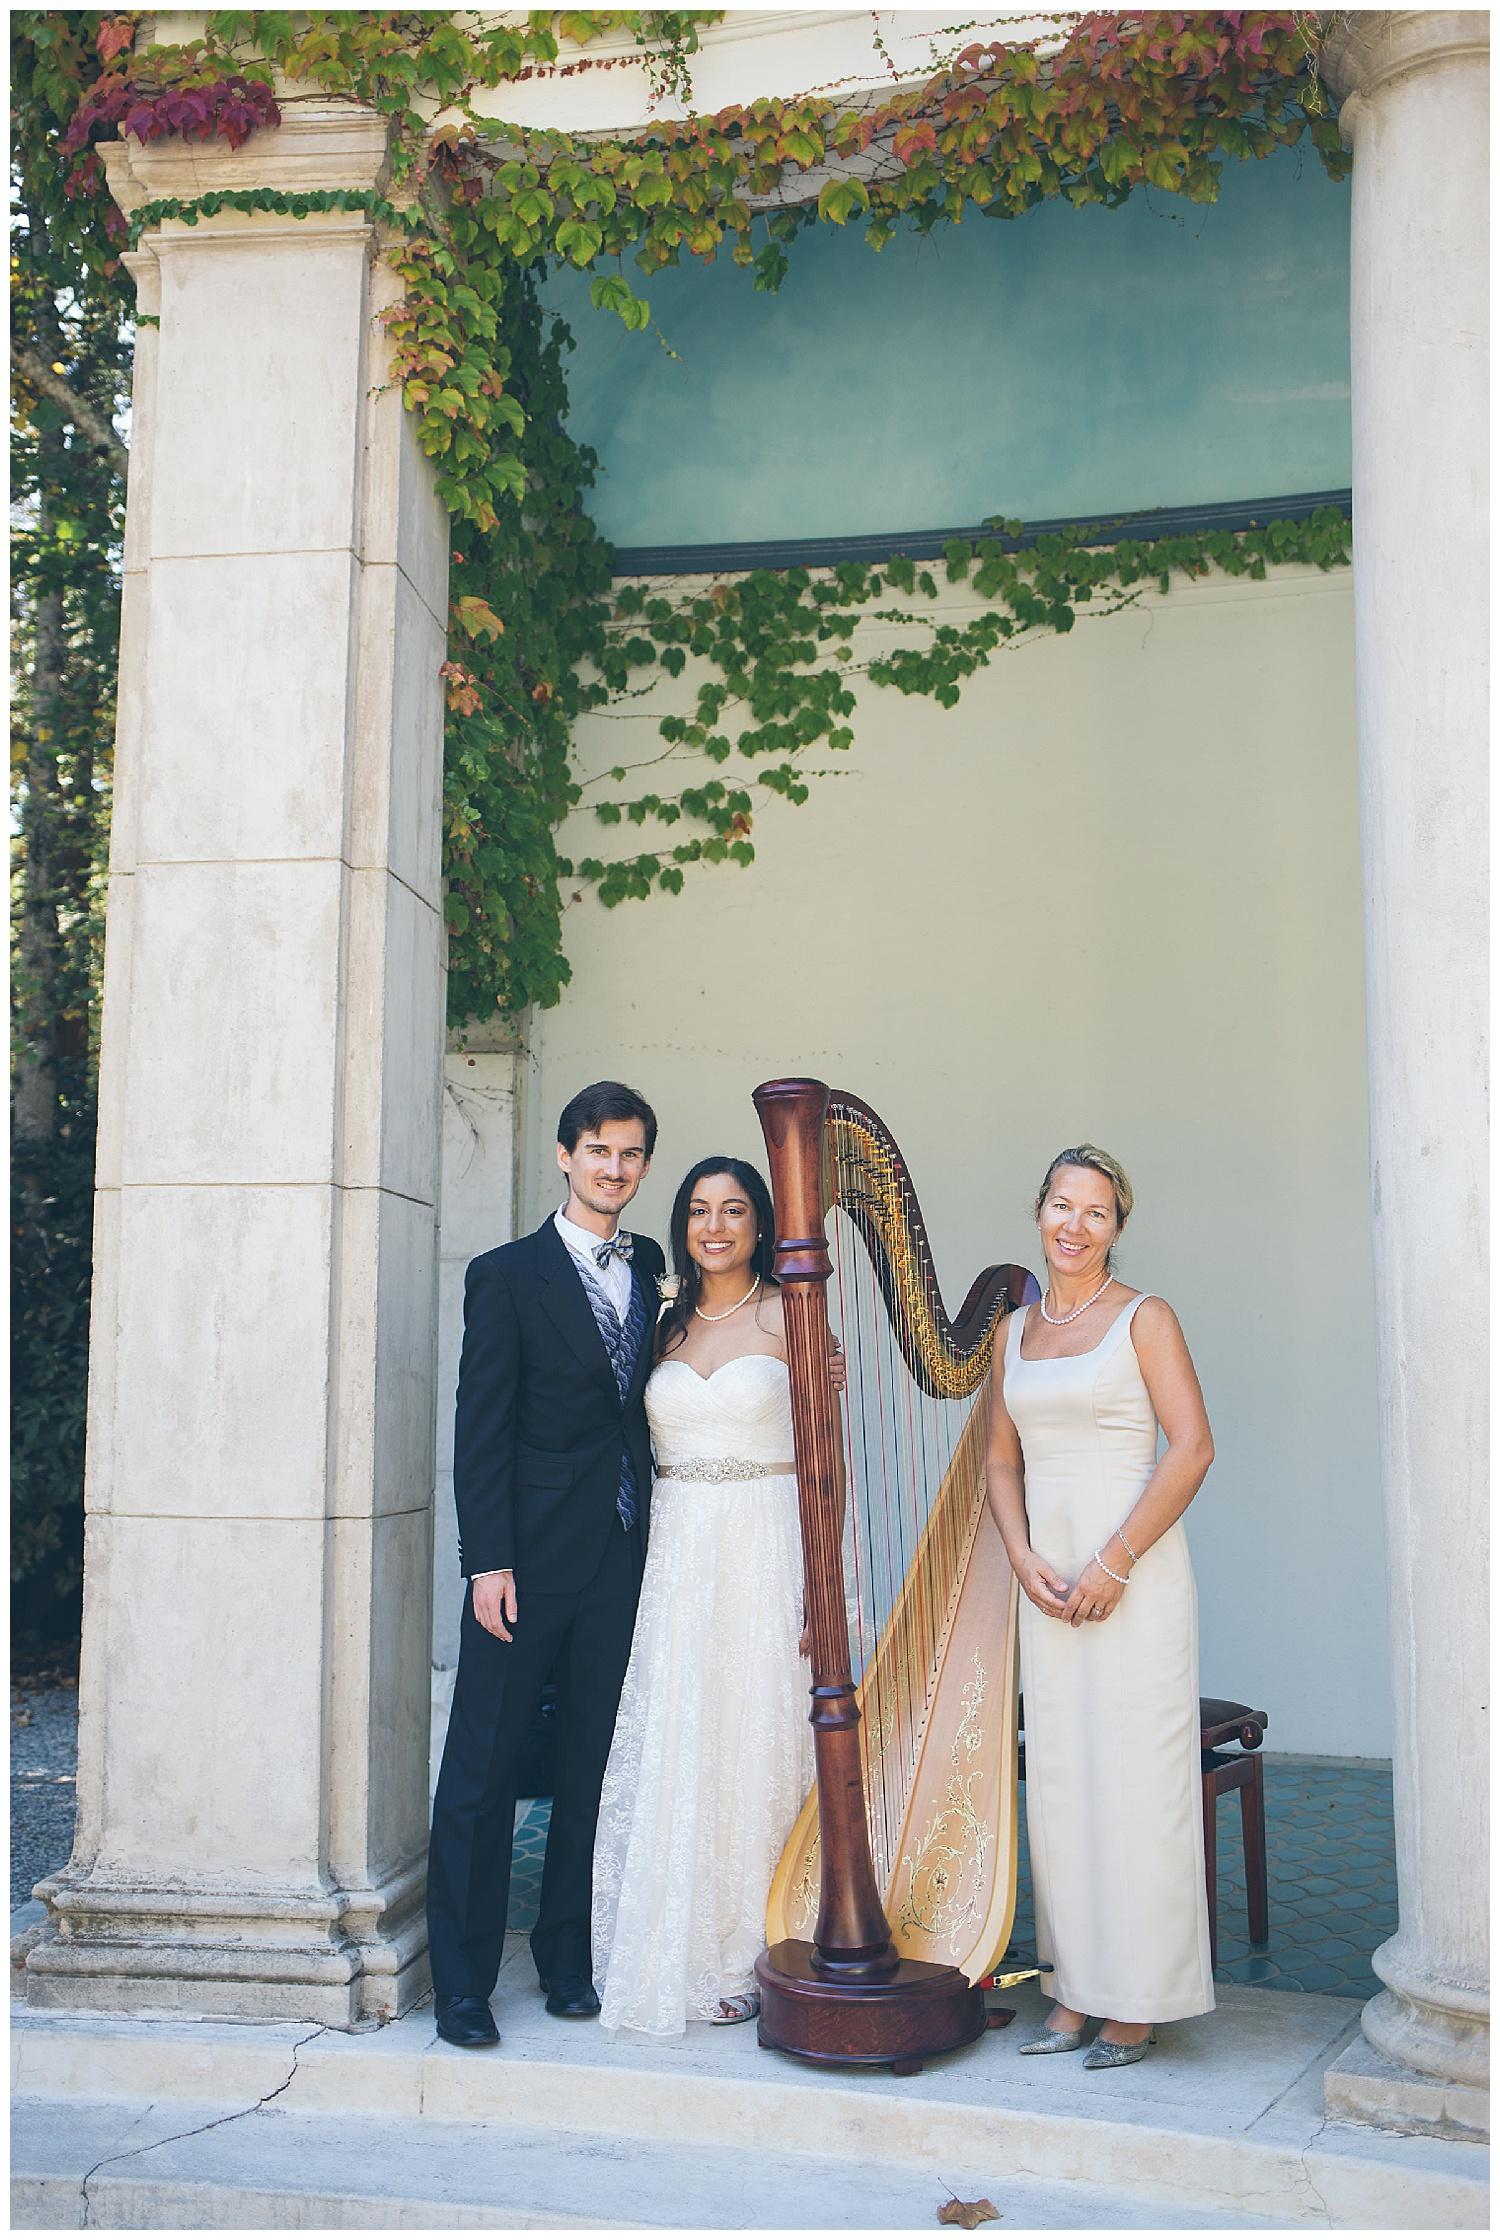 khariza-rae-photography-bay-area-wedding-photographer_0158.jpg